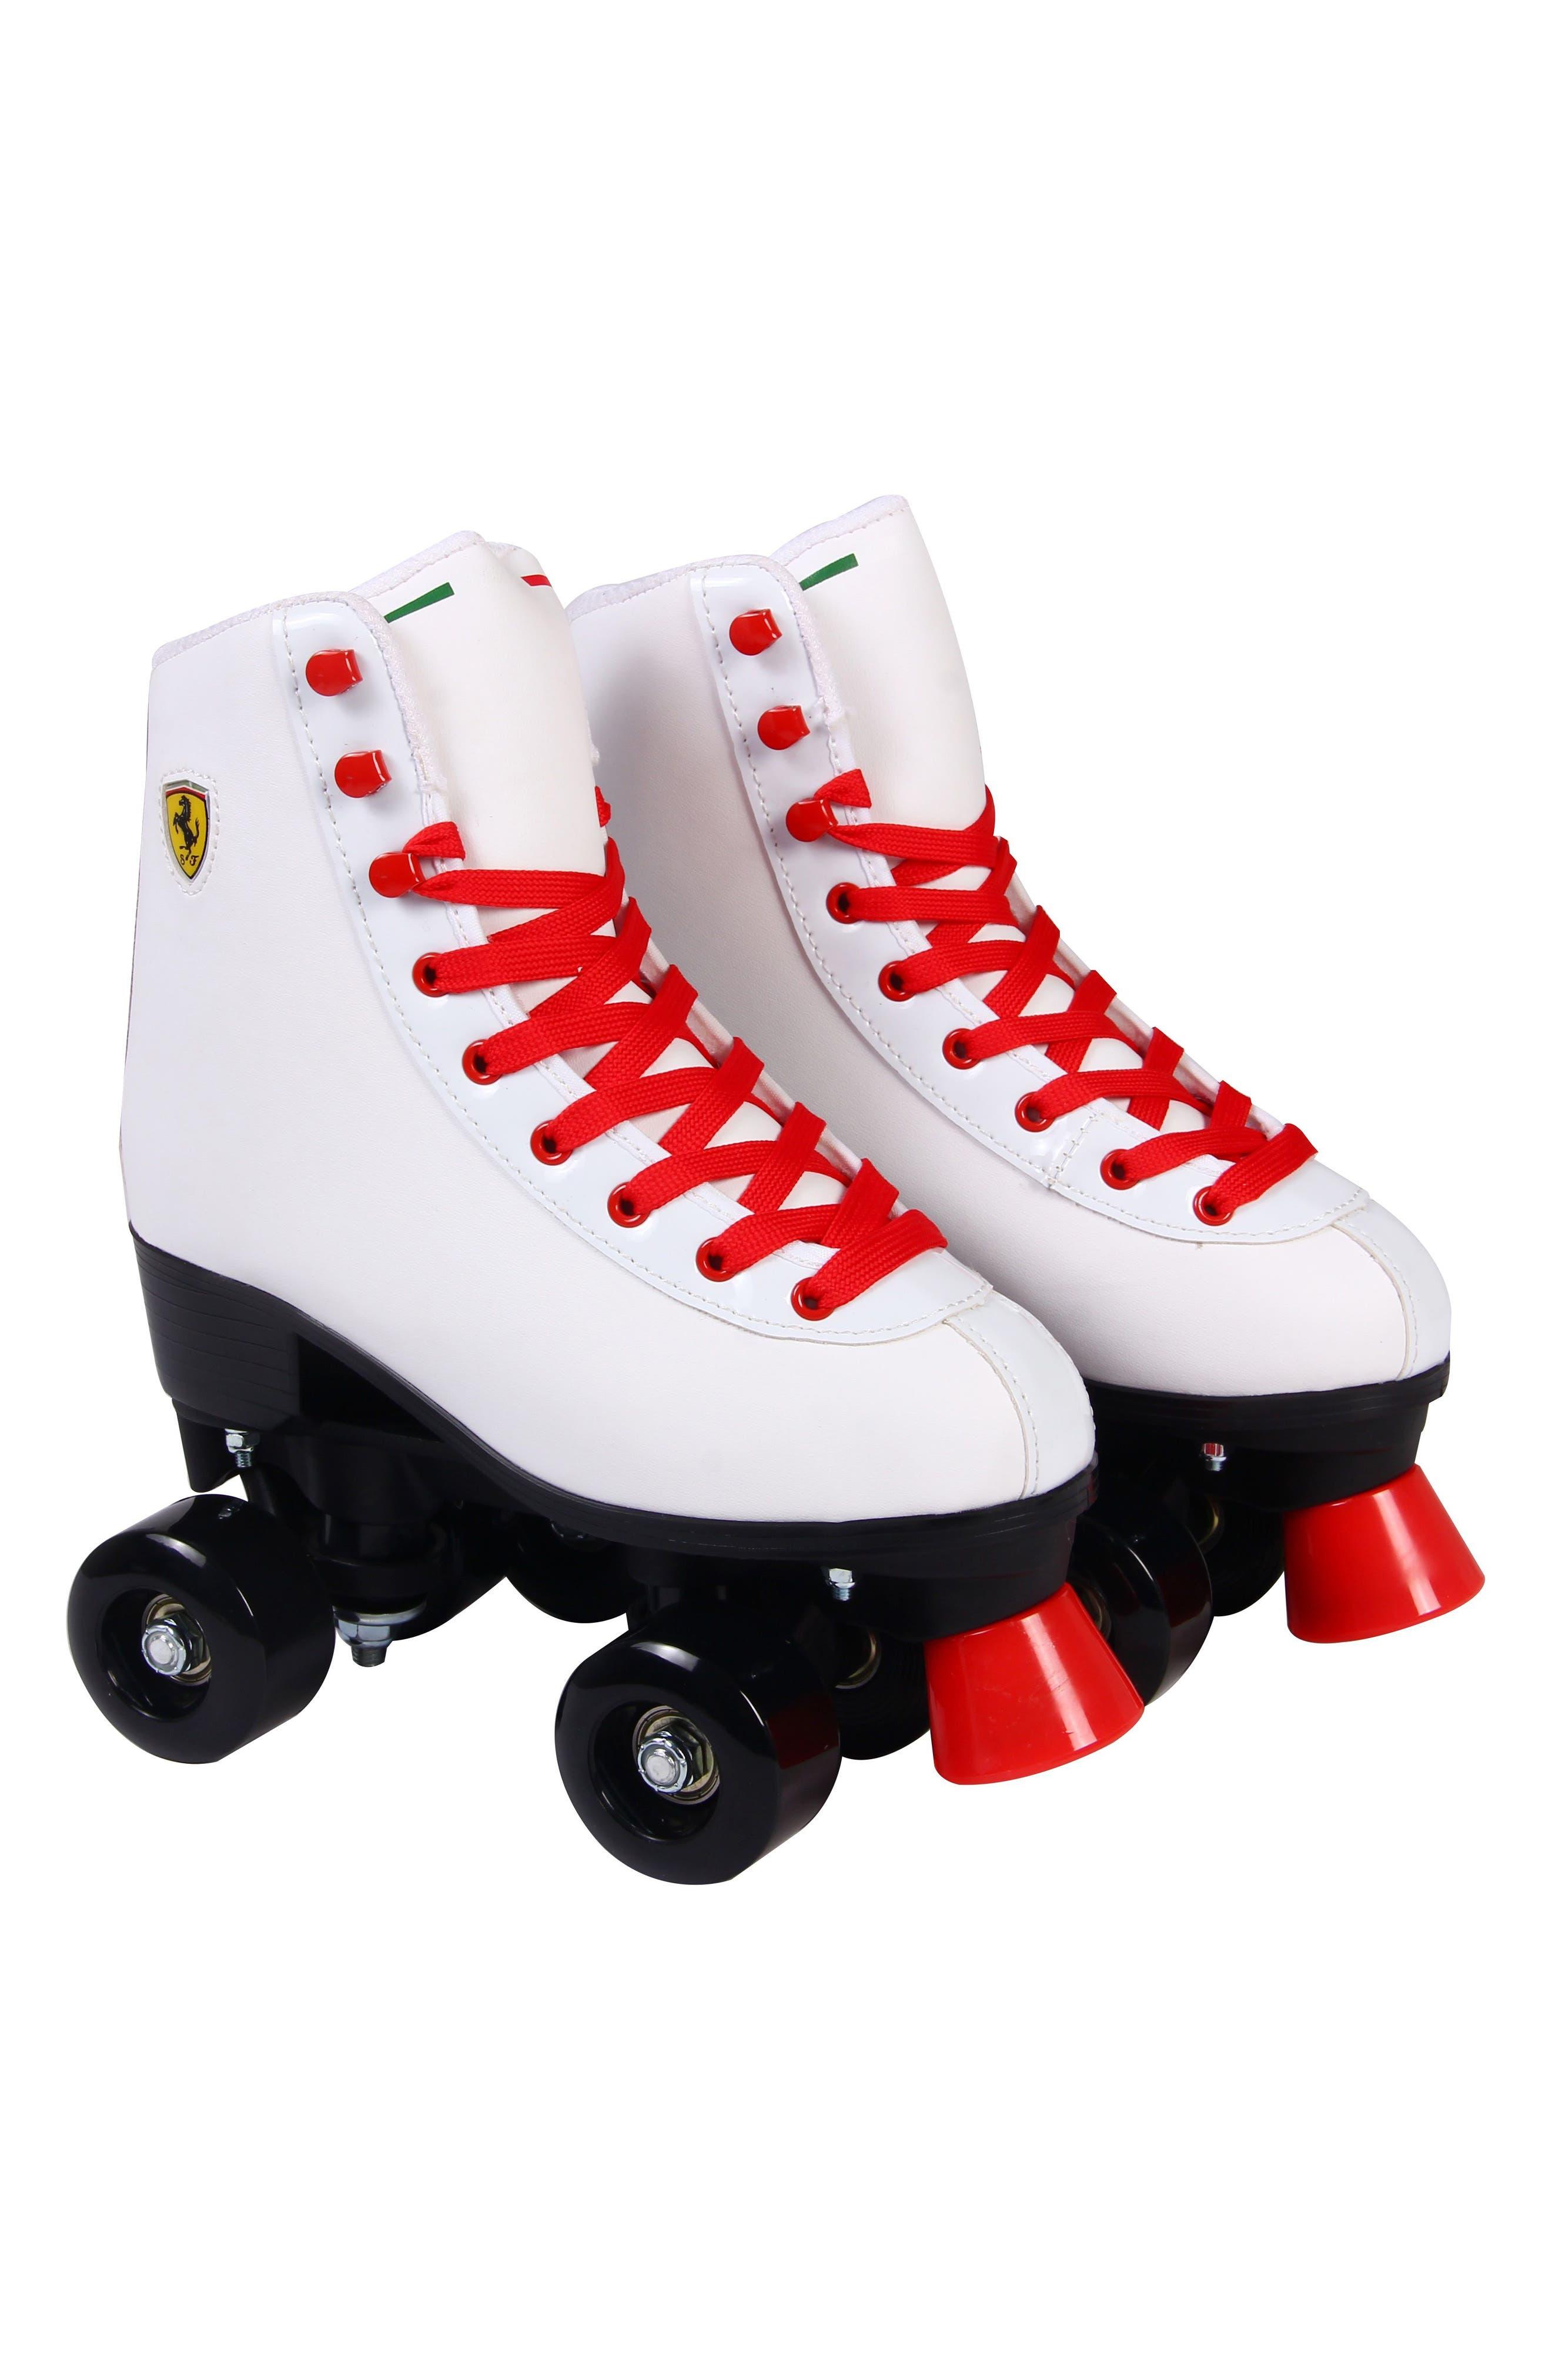 Classic Roller Skates,                             Main thumbnail 1, color,                             FERRARI WHITE